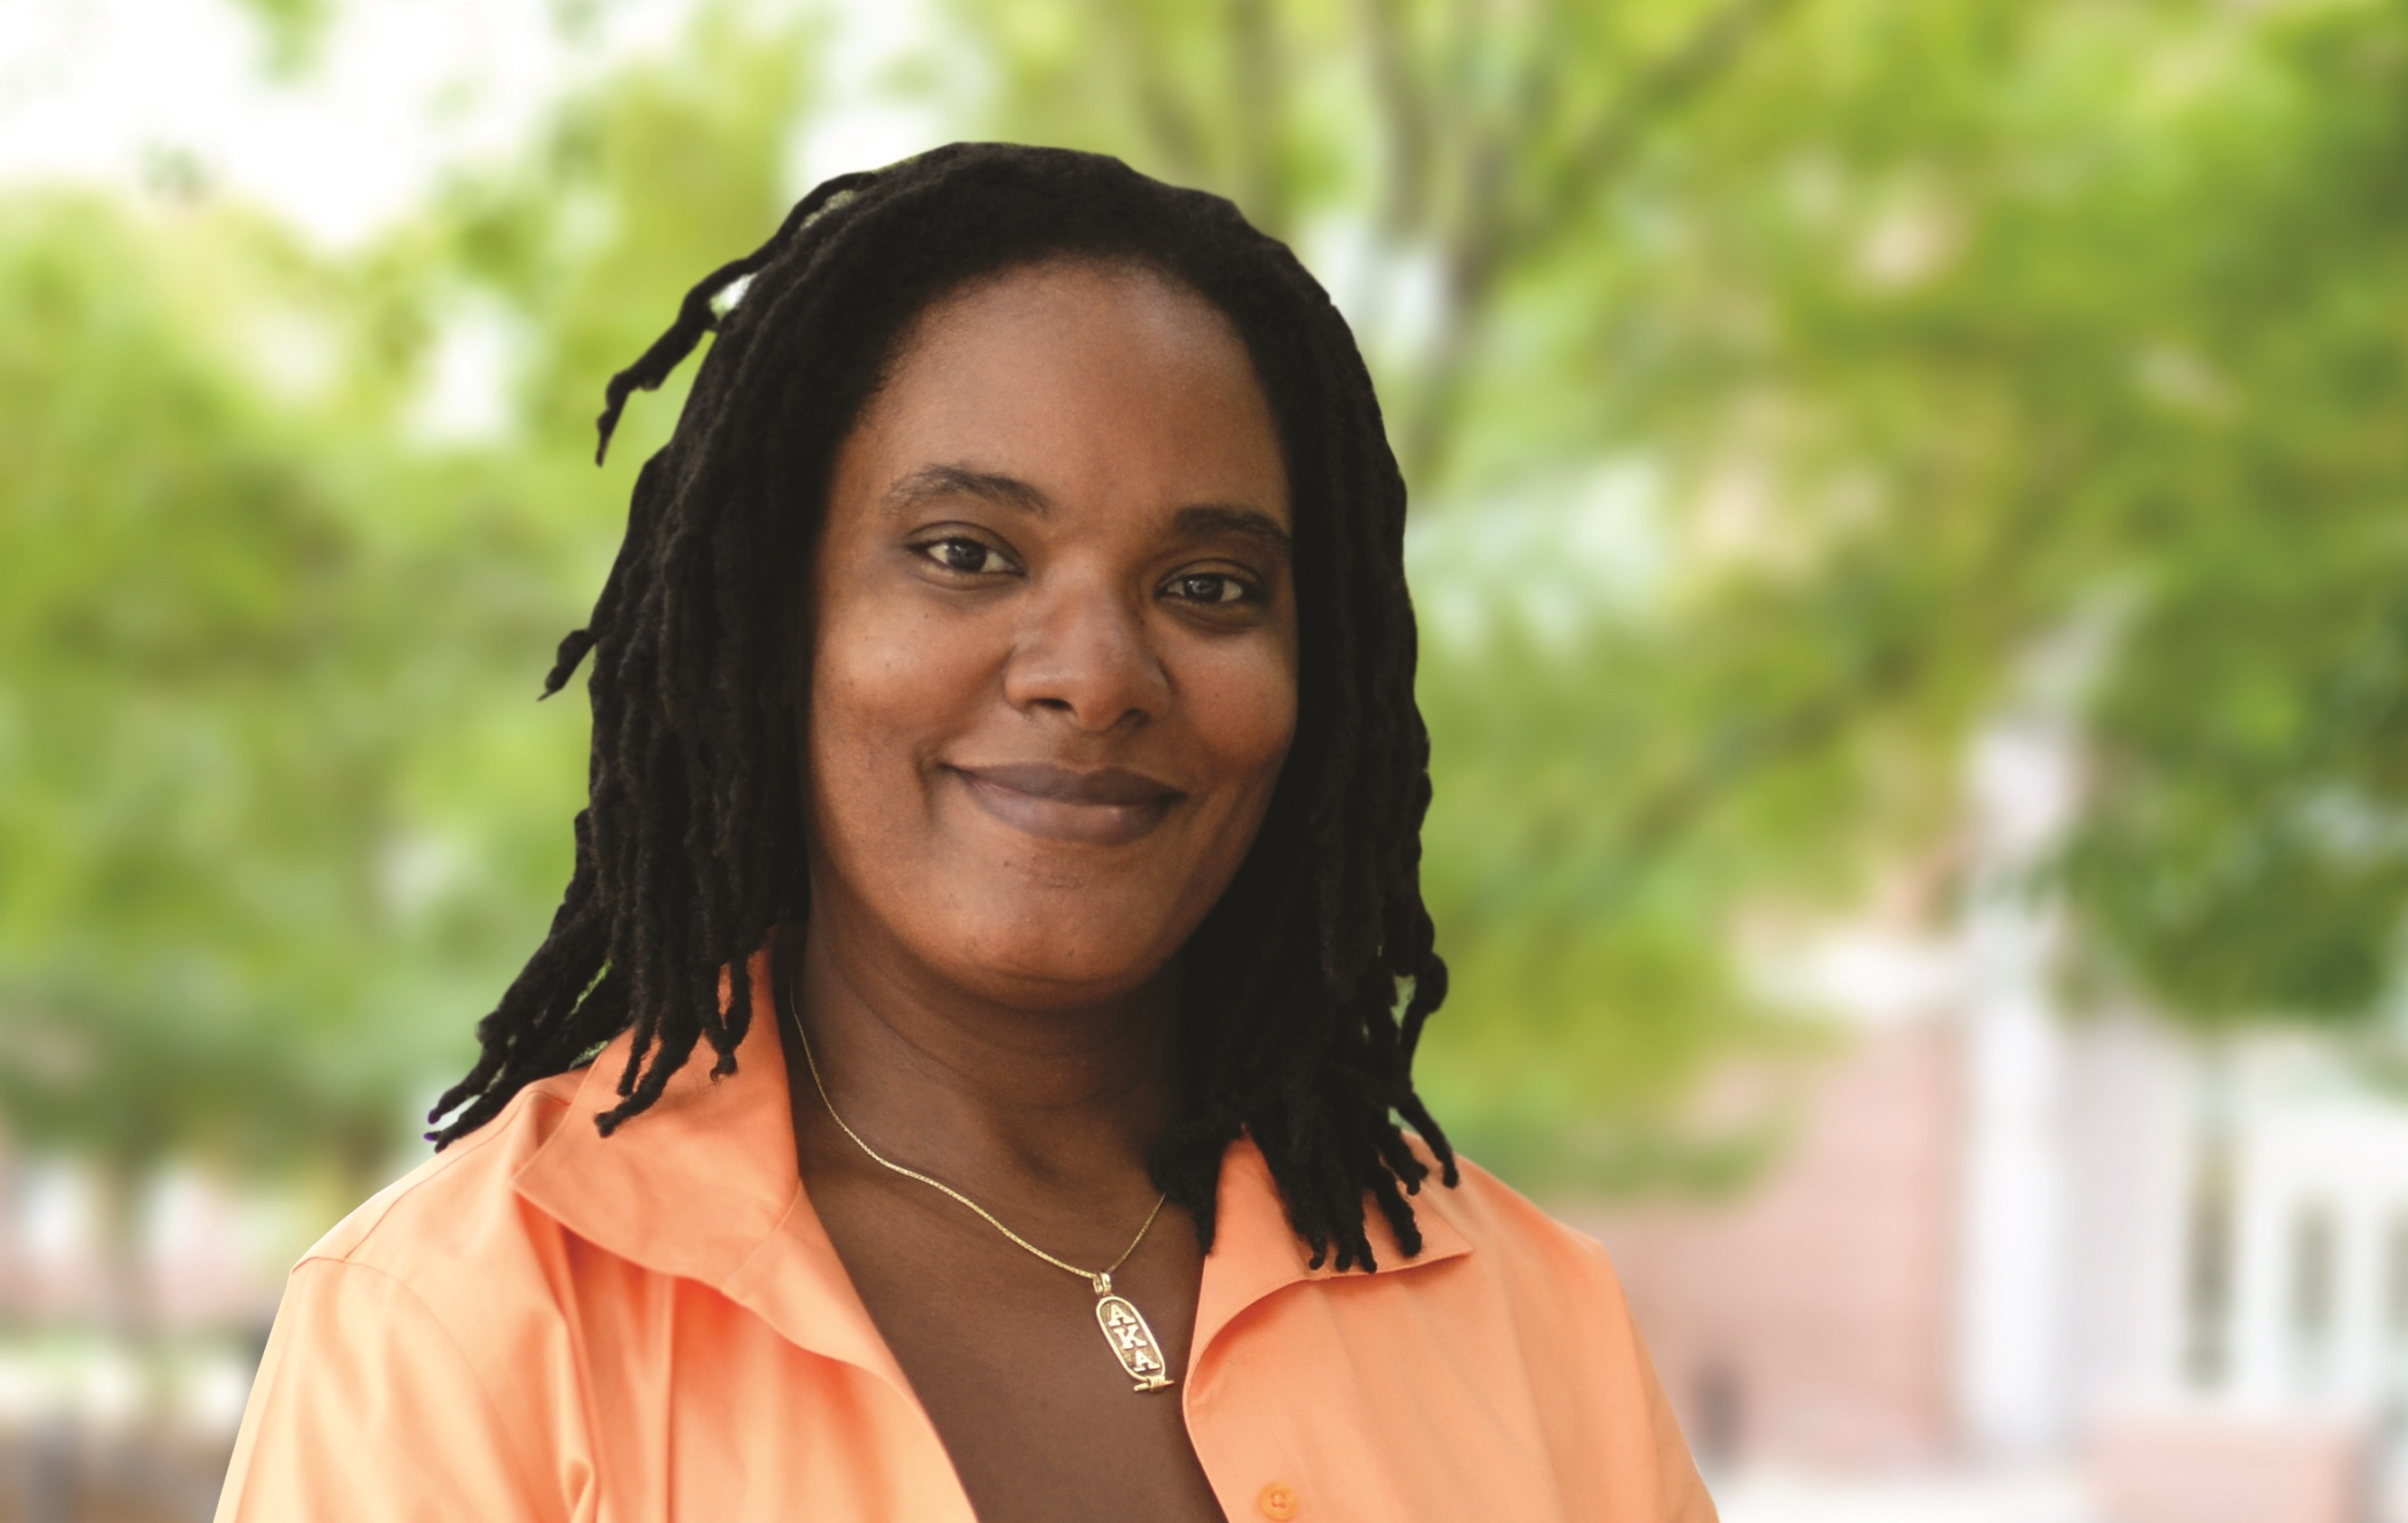 Jakita Thomas, Philpott-WestPoint Stevens Associate Professor in the Department of Computer Science and Software Engineering at Auburn University